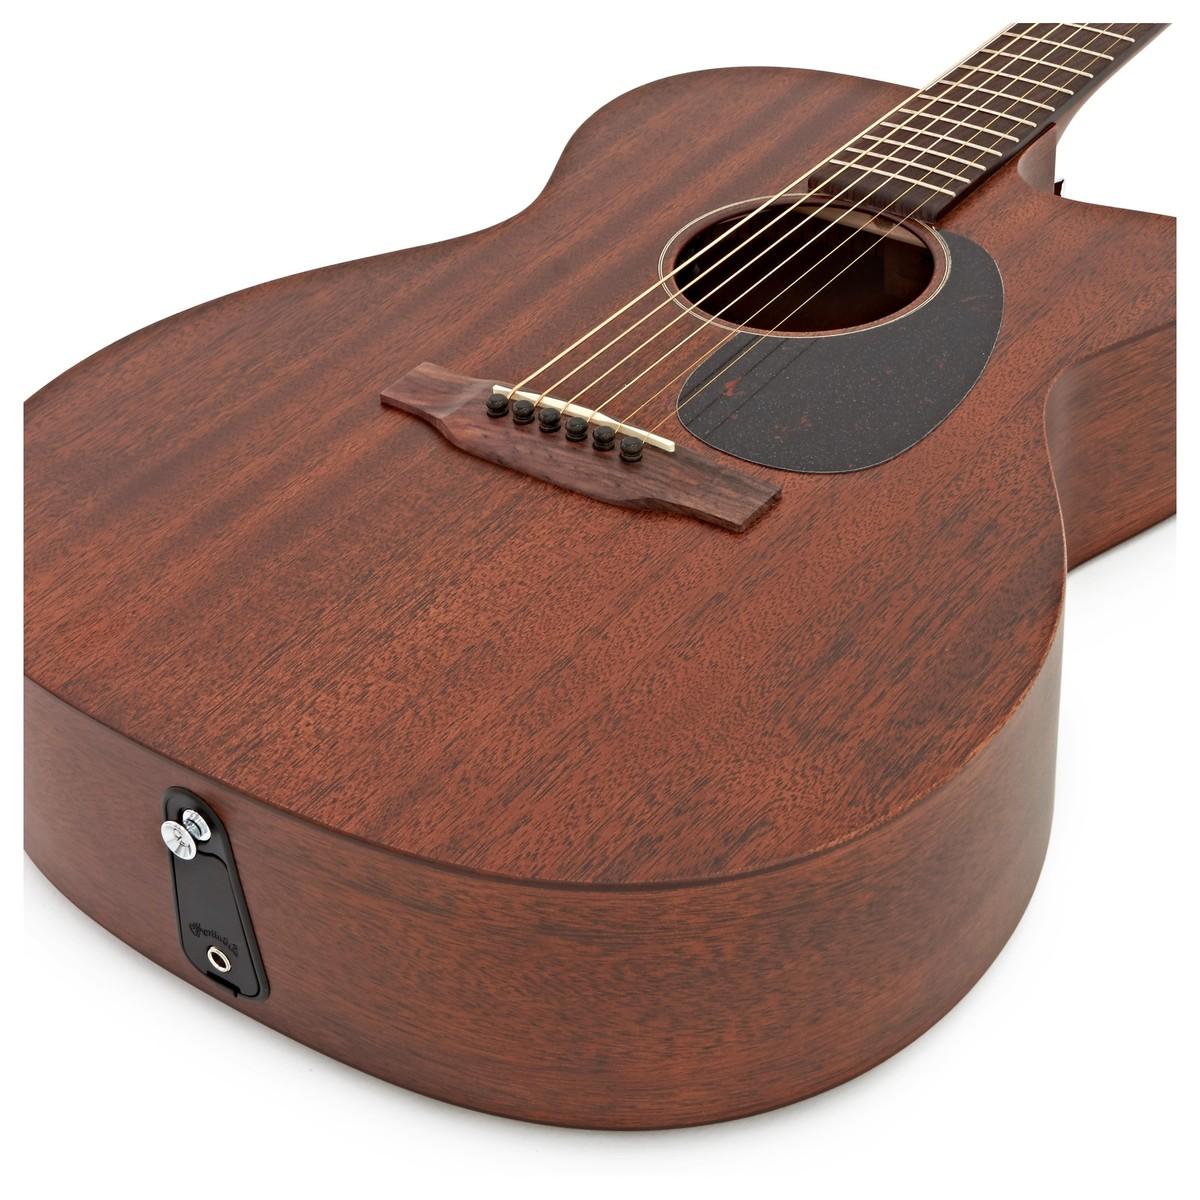 guitare electro acoustique martin moc 15me avec matrice vt. Black Bedroom Furniture Sets. Home Design Ideas